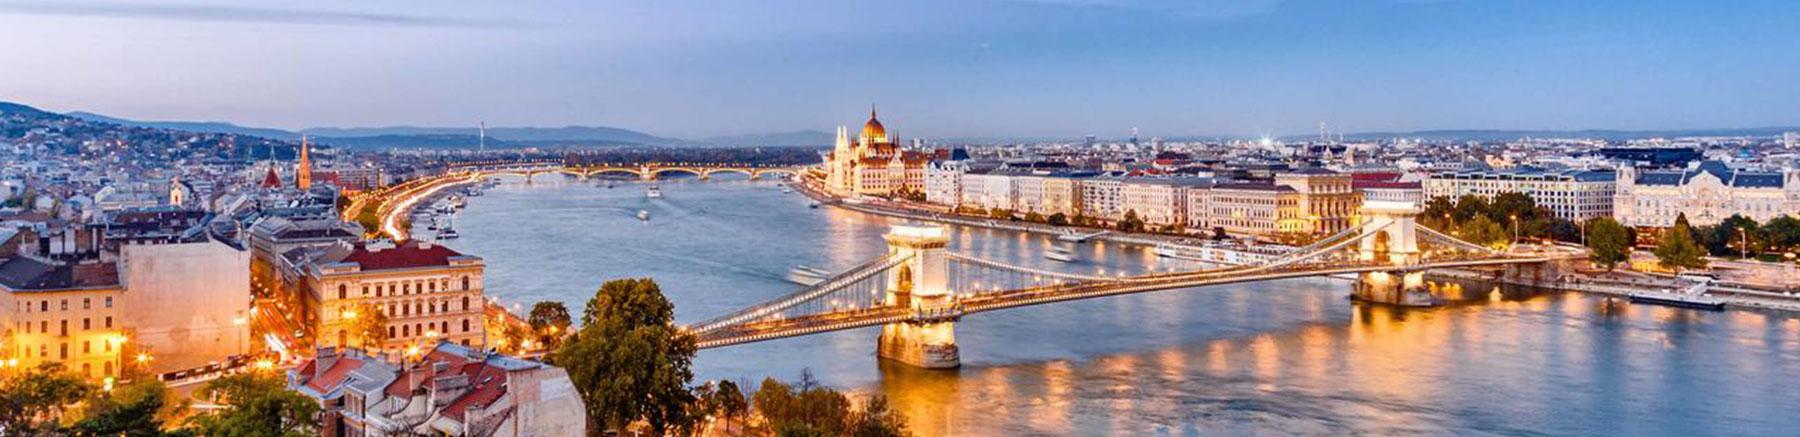 Porównaj transfery z lotniska w Budapeszcie